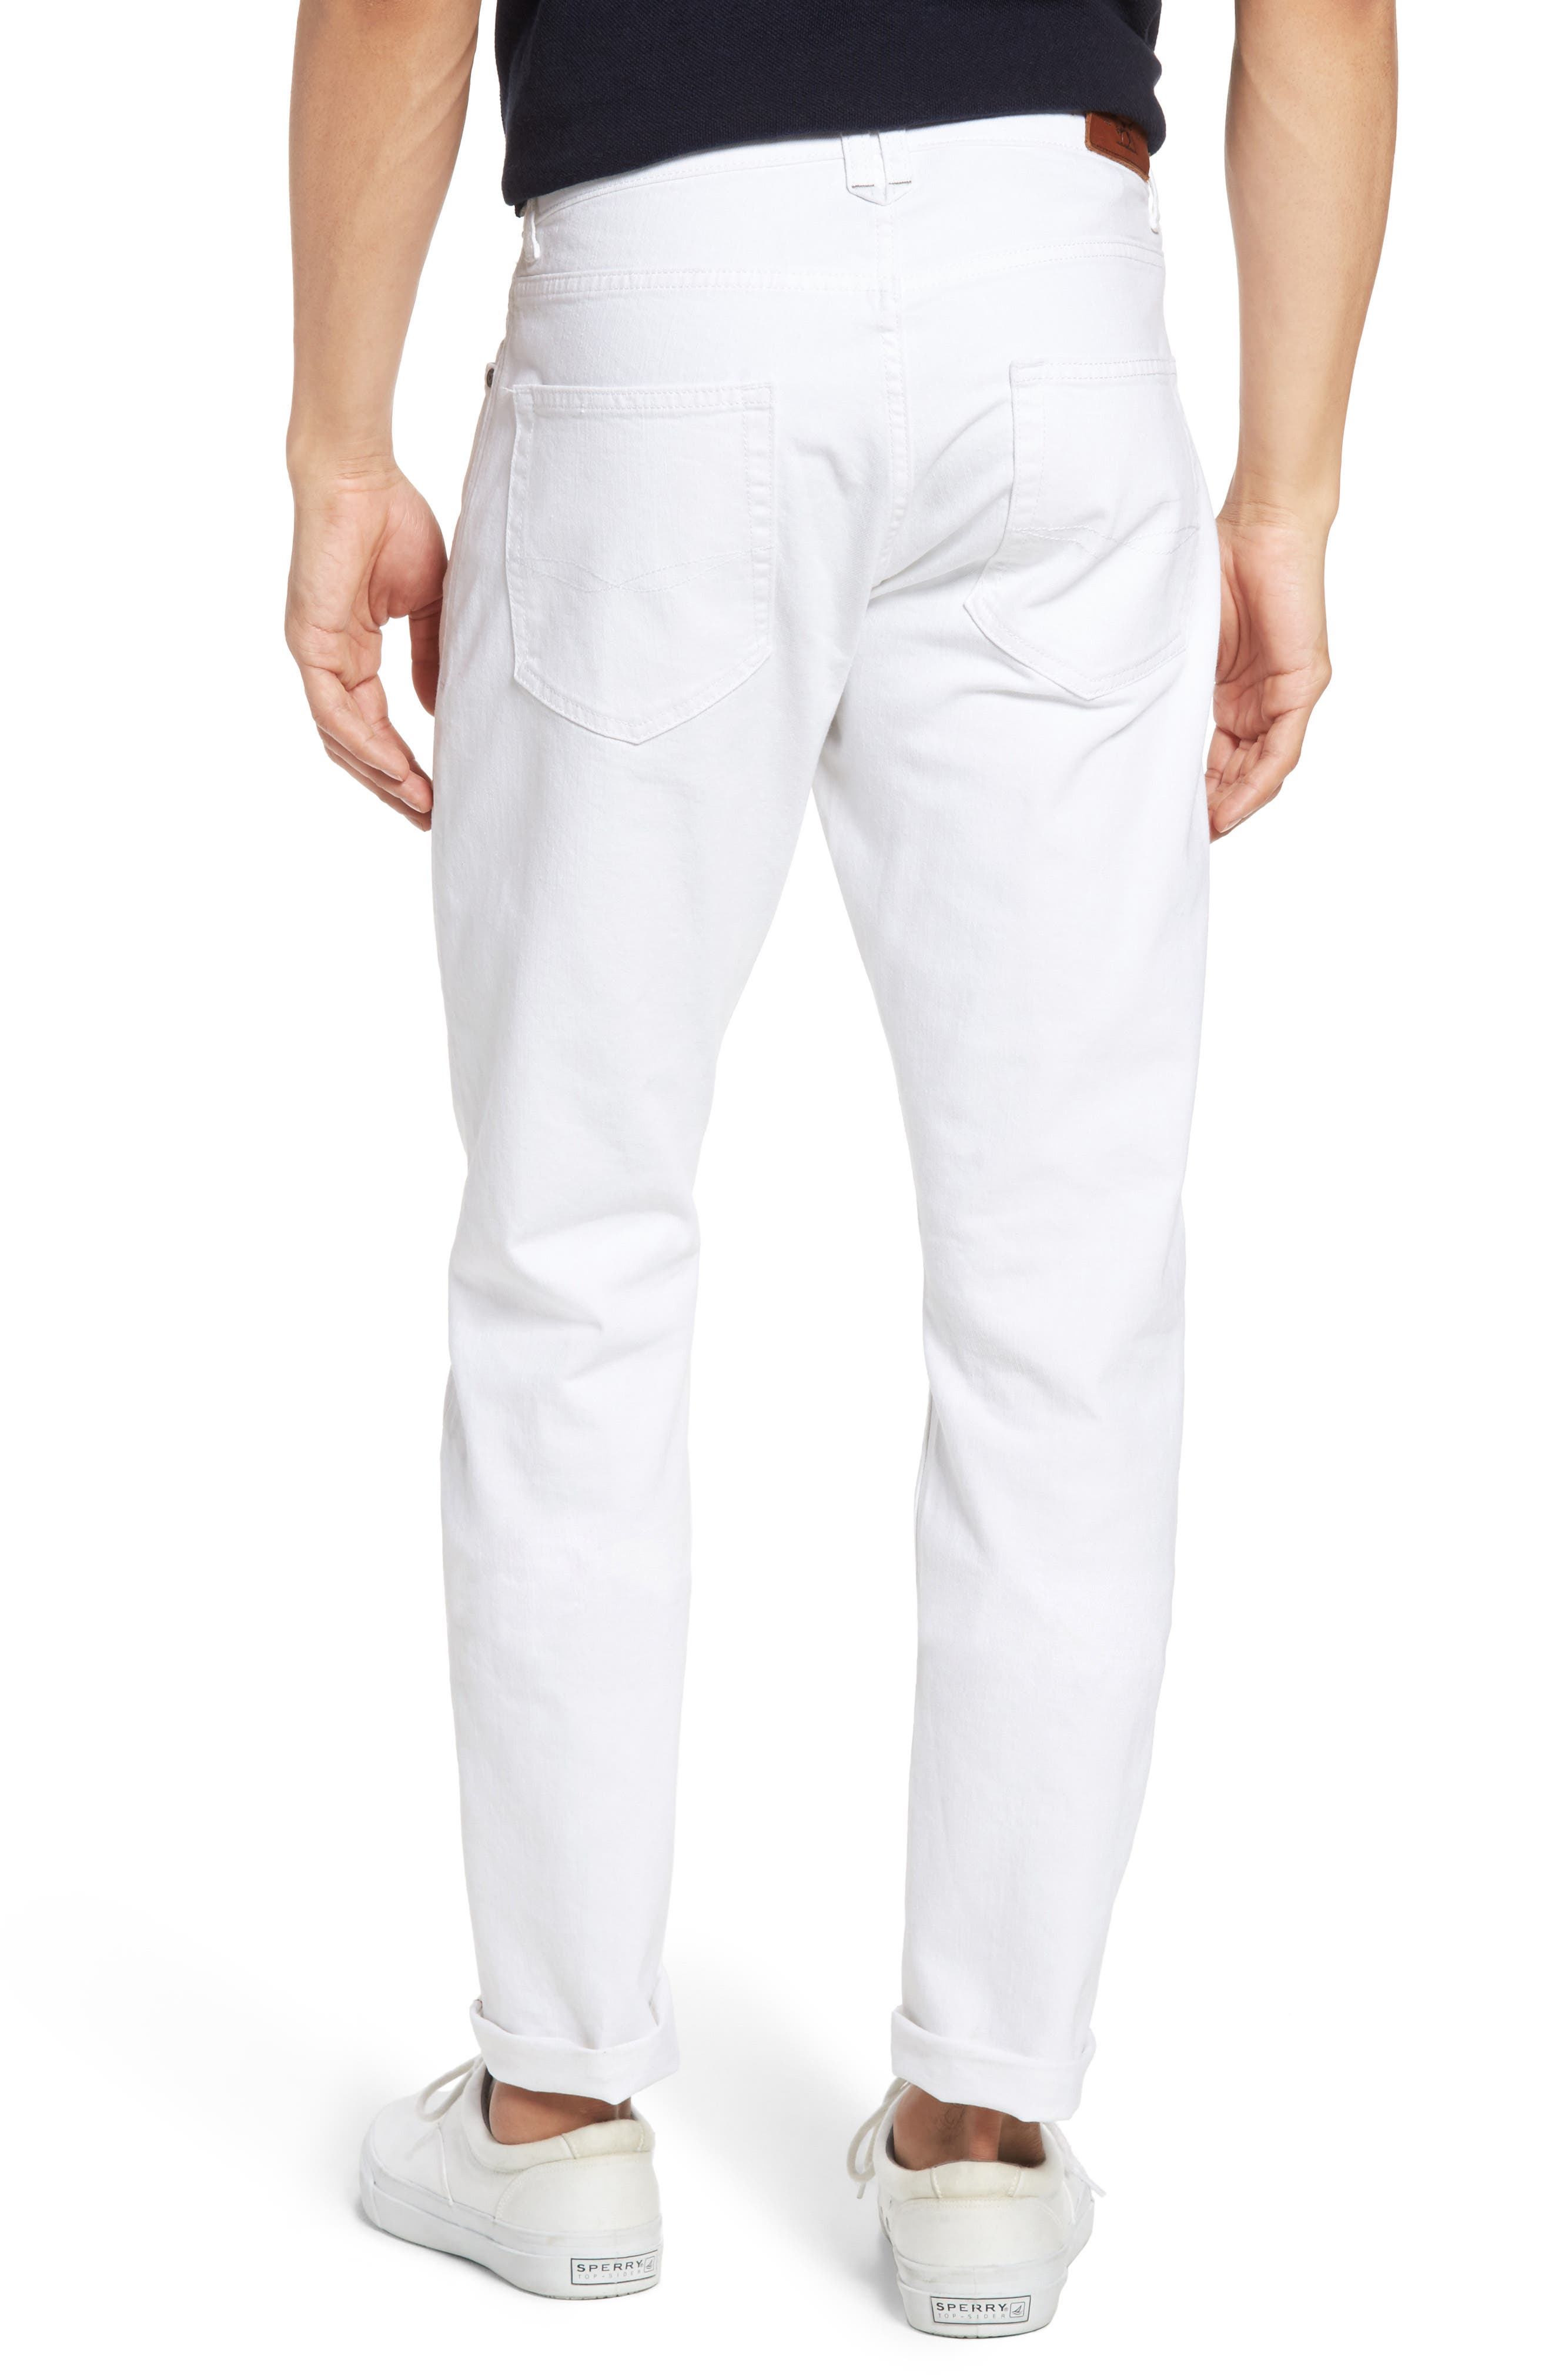 Allemand Straight Leg Jeans,                             Alternate thumbnail 2, color,                             Snow